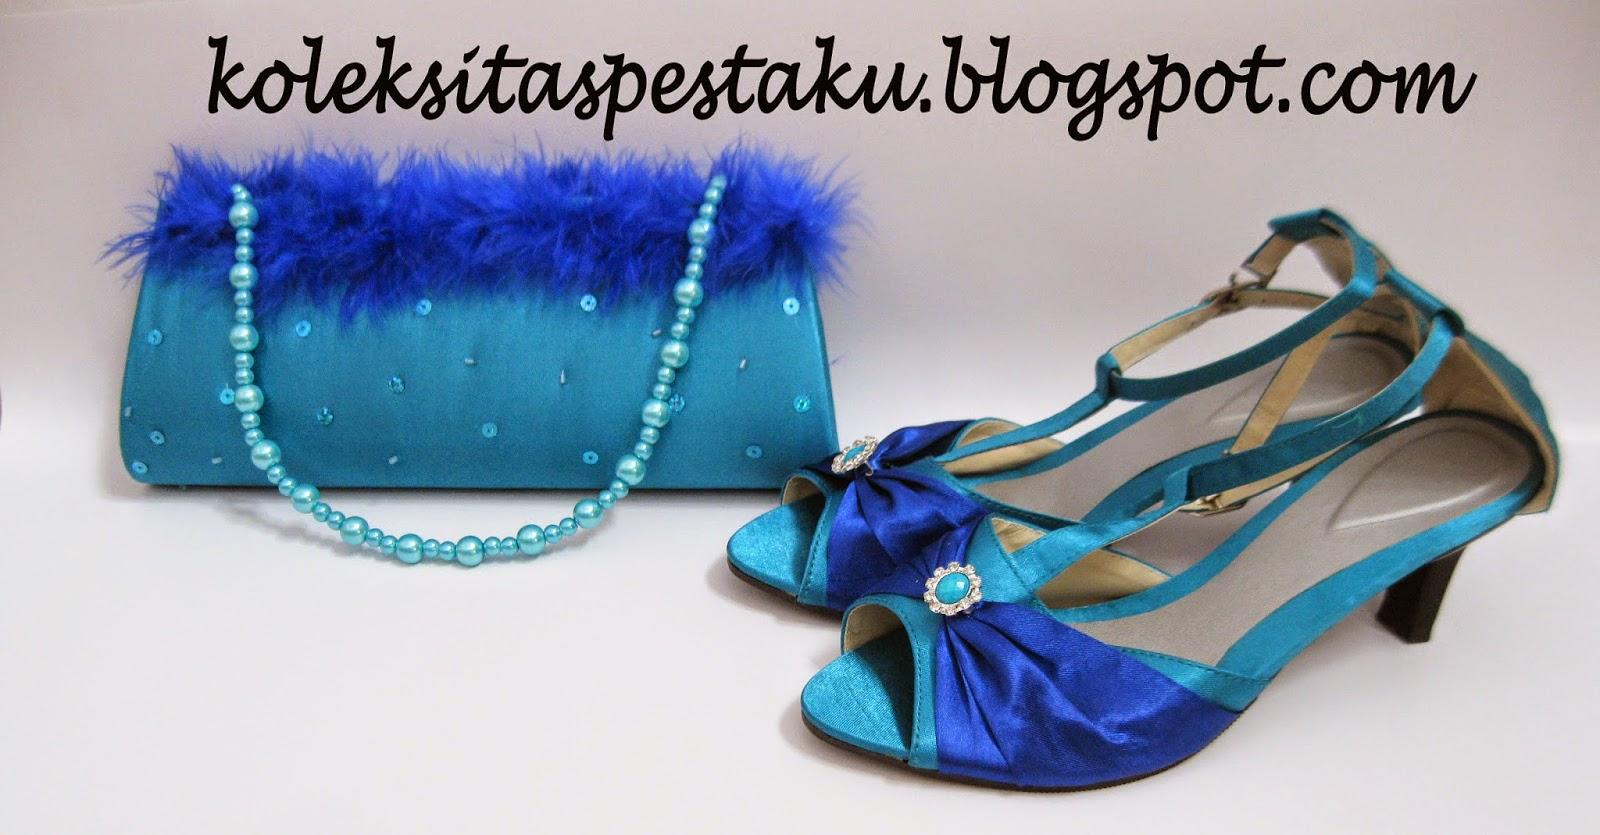 Model Terbaru Sepatu Pesta Biru Cantik Koleksi Tas Pesta Ku